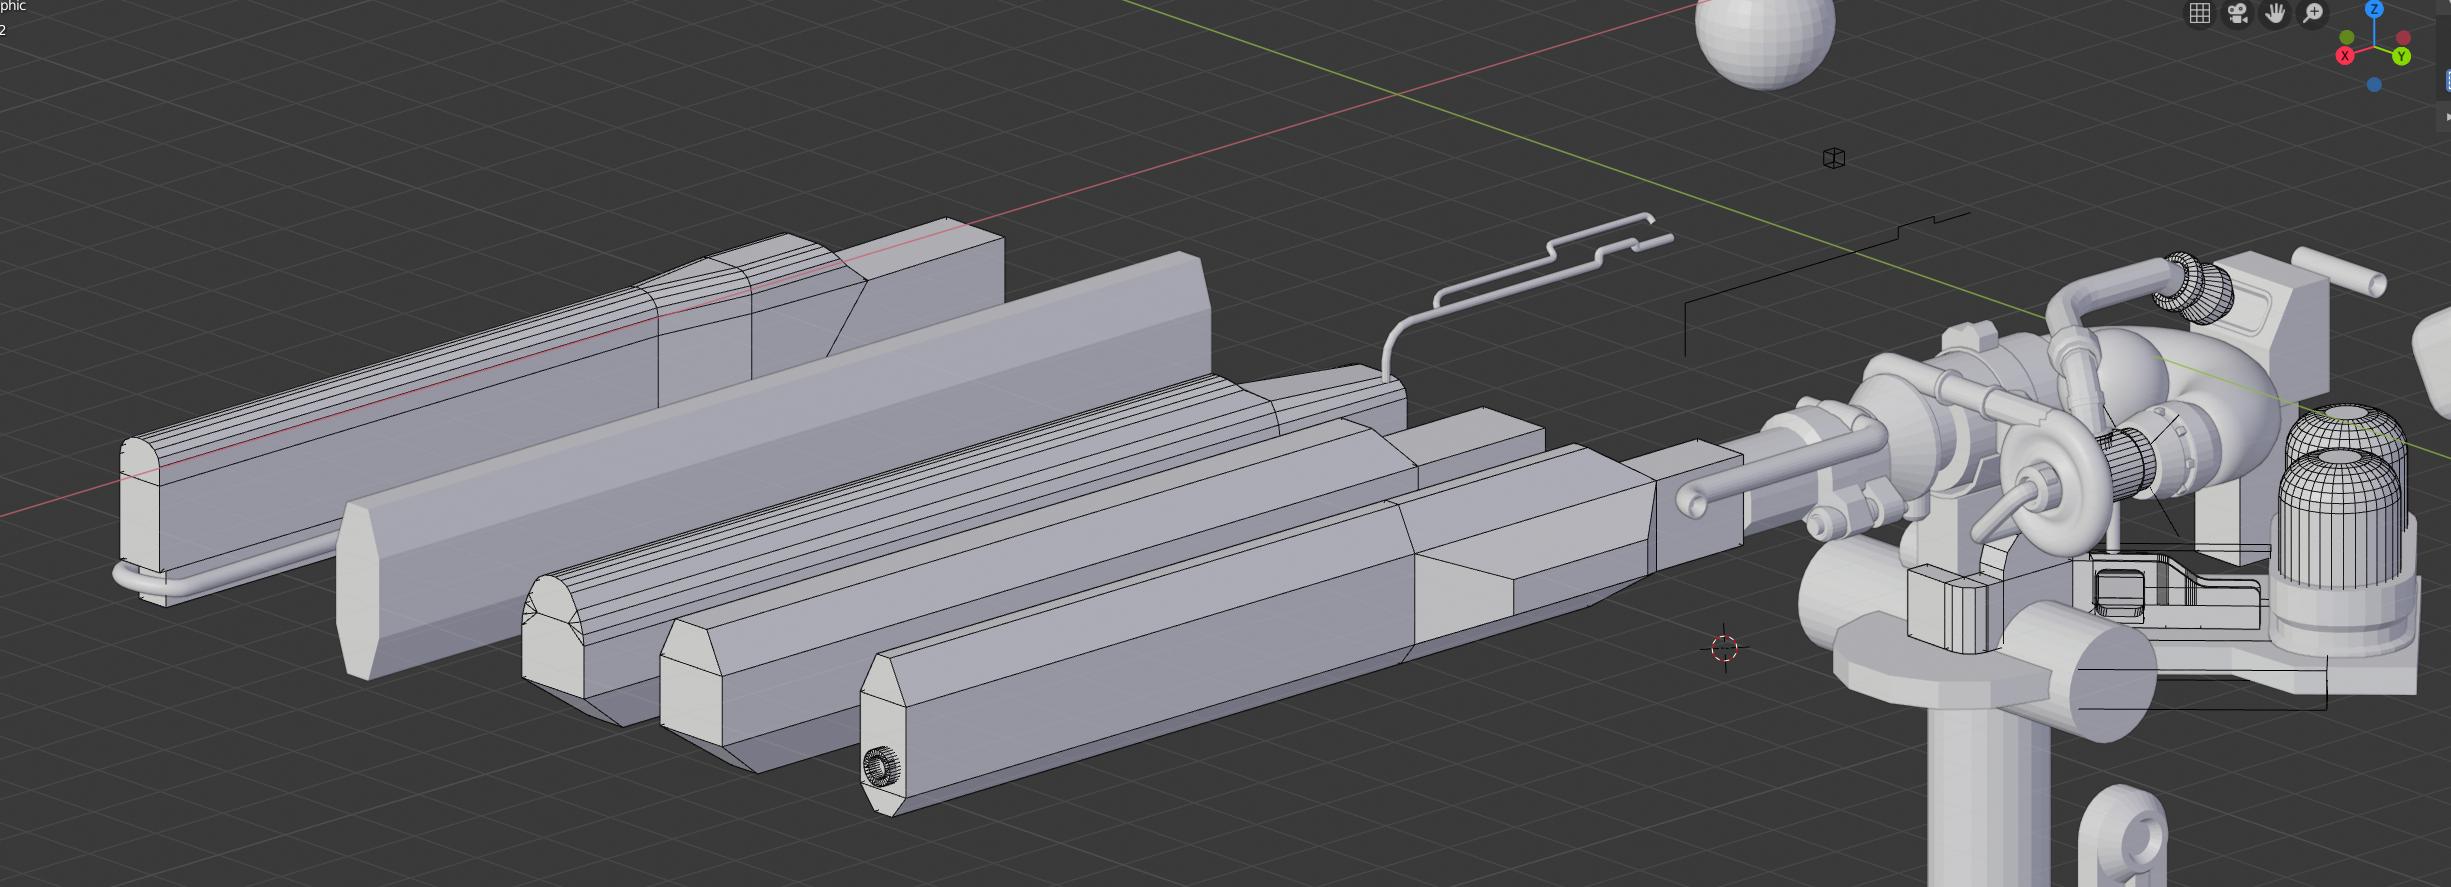 Three D Guns 2 - Challenge - Naval Cannon